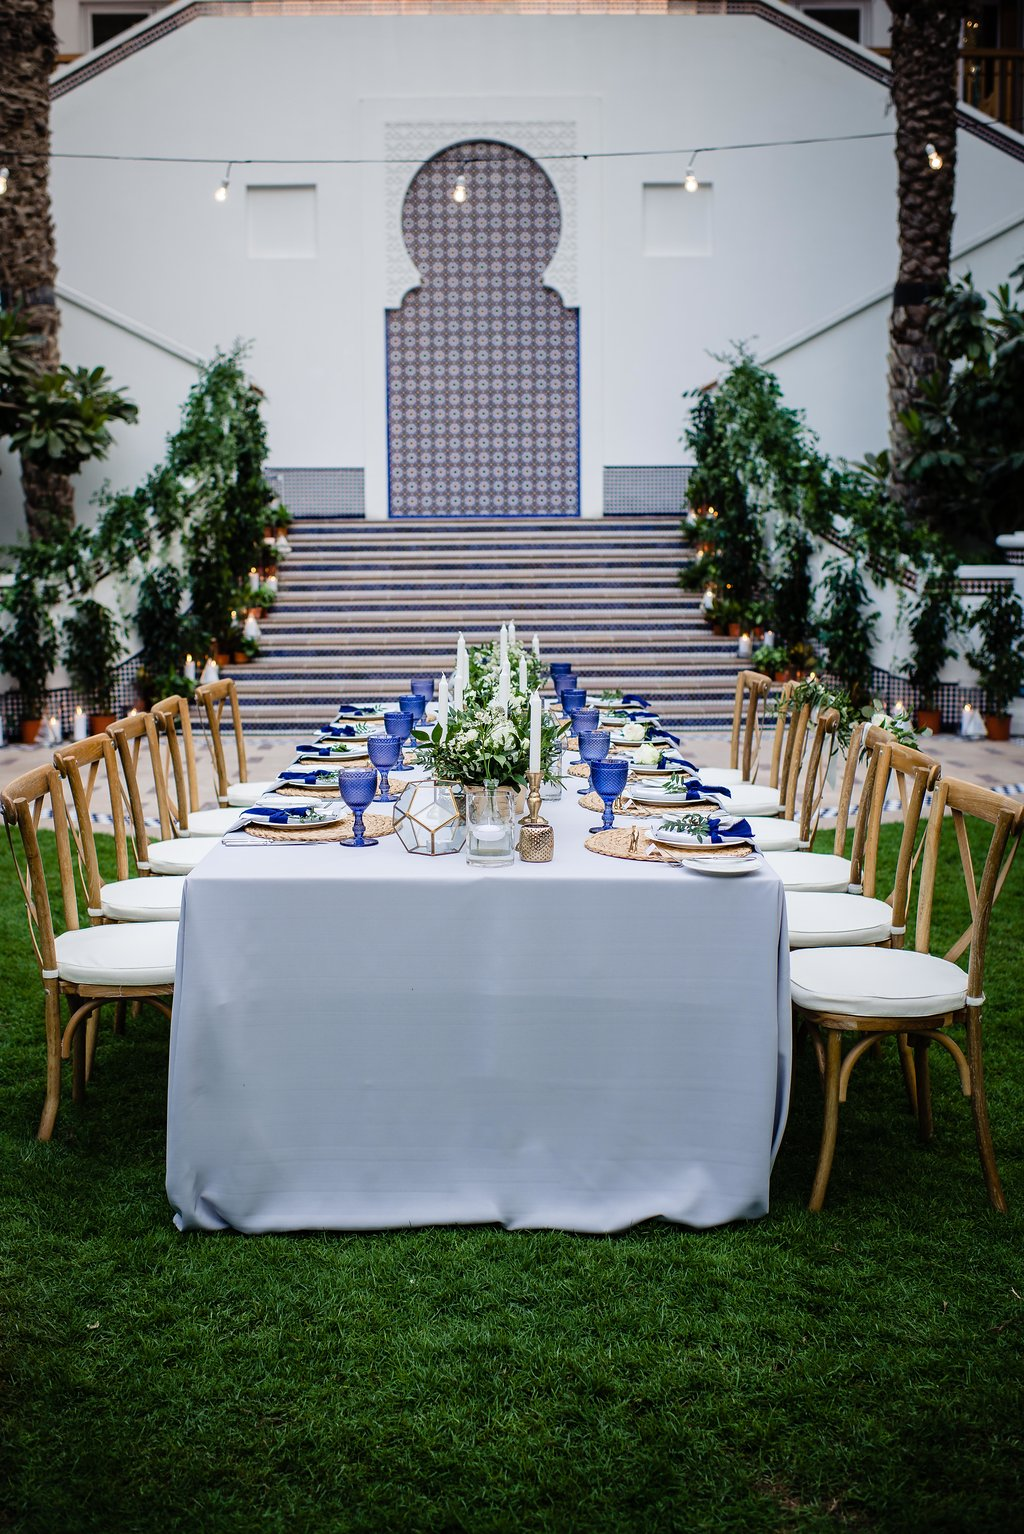 PARK HYATT WEDDING - STYLING BY MY LOVELY WEDDING DUBAI